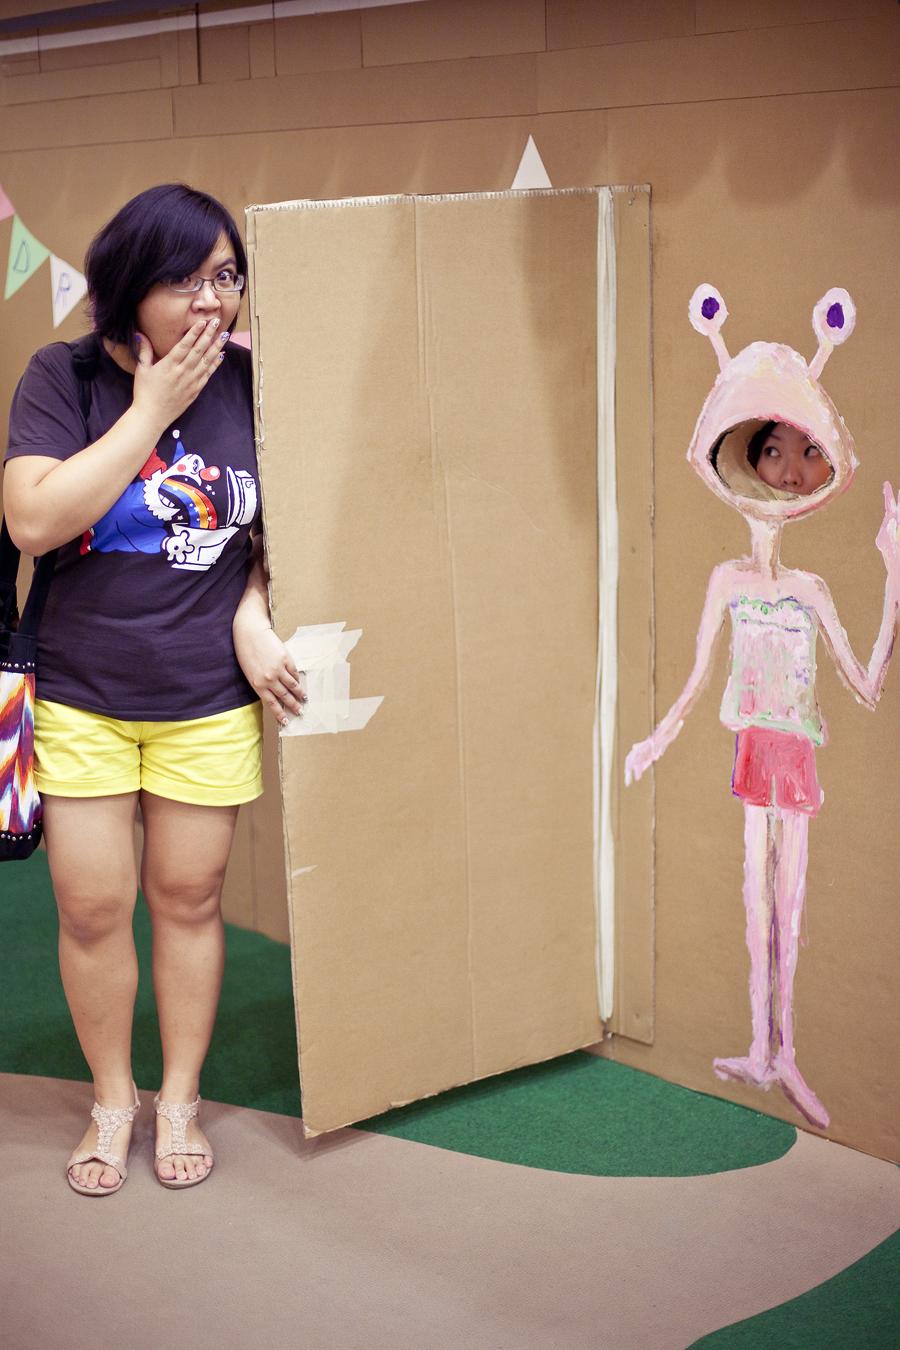 Cardboard playground for the Masak Masak exhibit at the National Museum of Singapore.